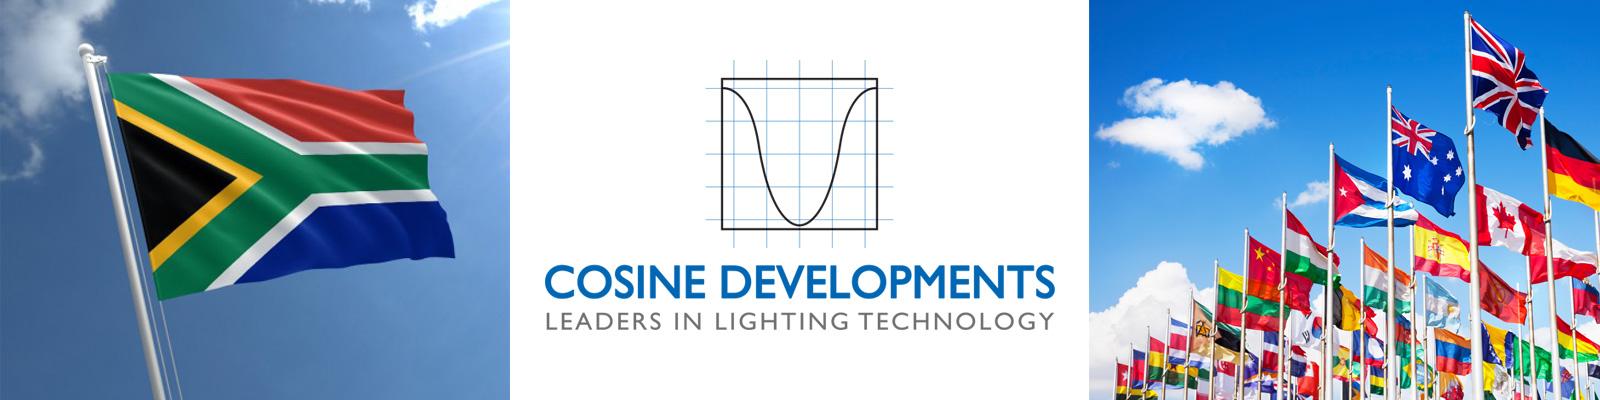 Cosine Developments, emergency lighting, smart product, durban, south africa